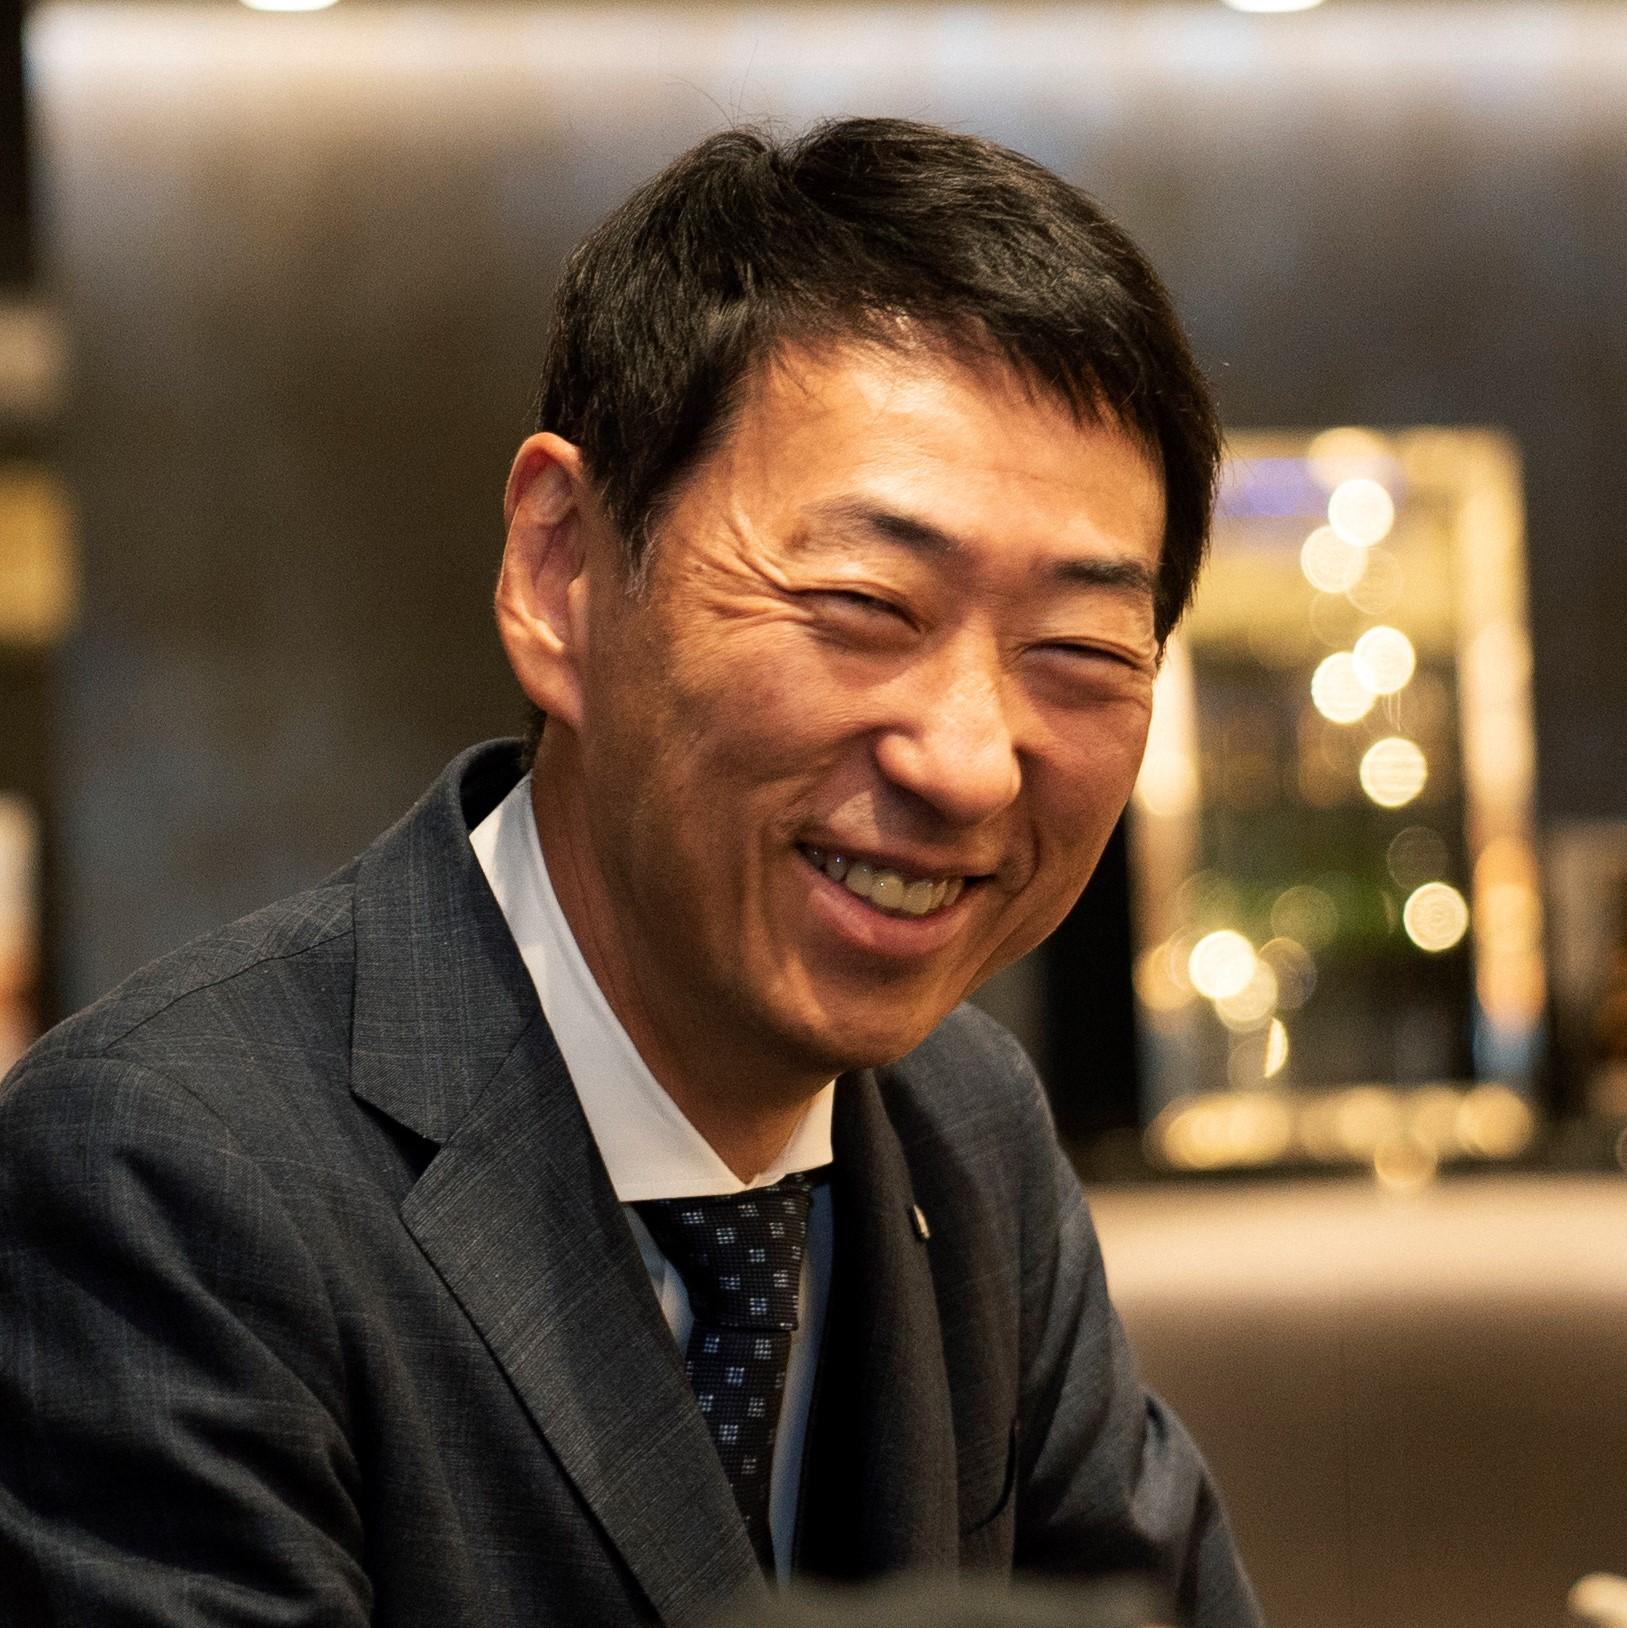 kamata株式会社オープンハウス 副社長 鎌田和彦